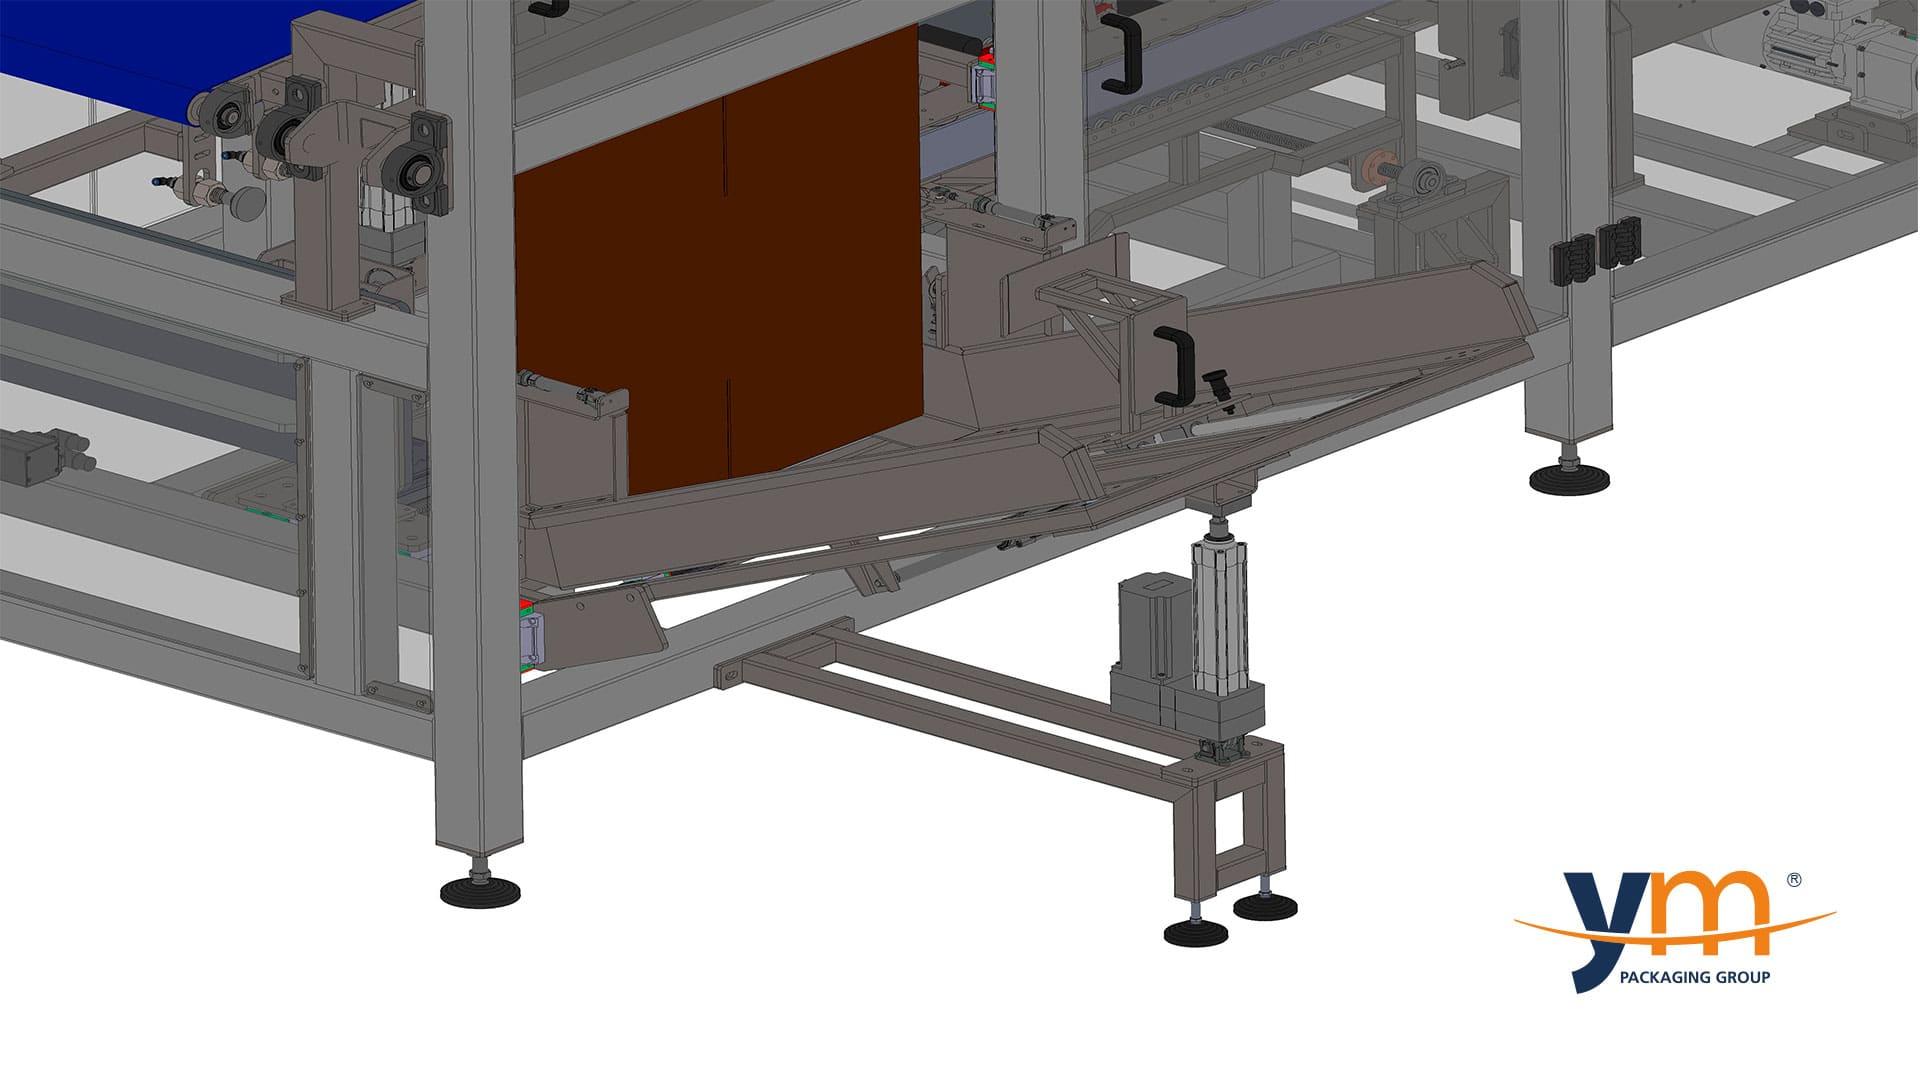 Línea de encajado o empaquetado multiformato